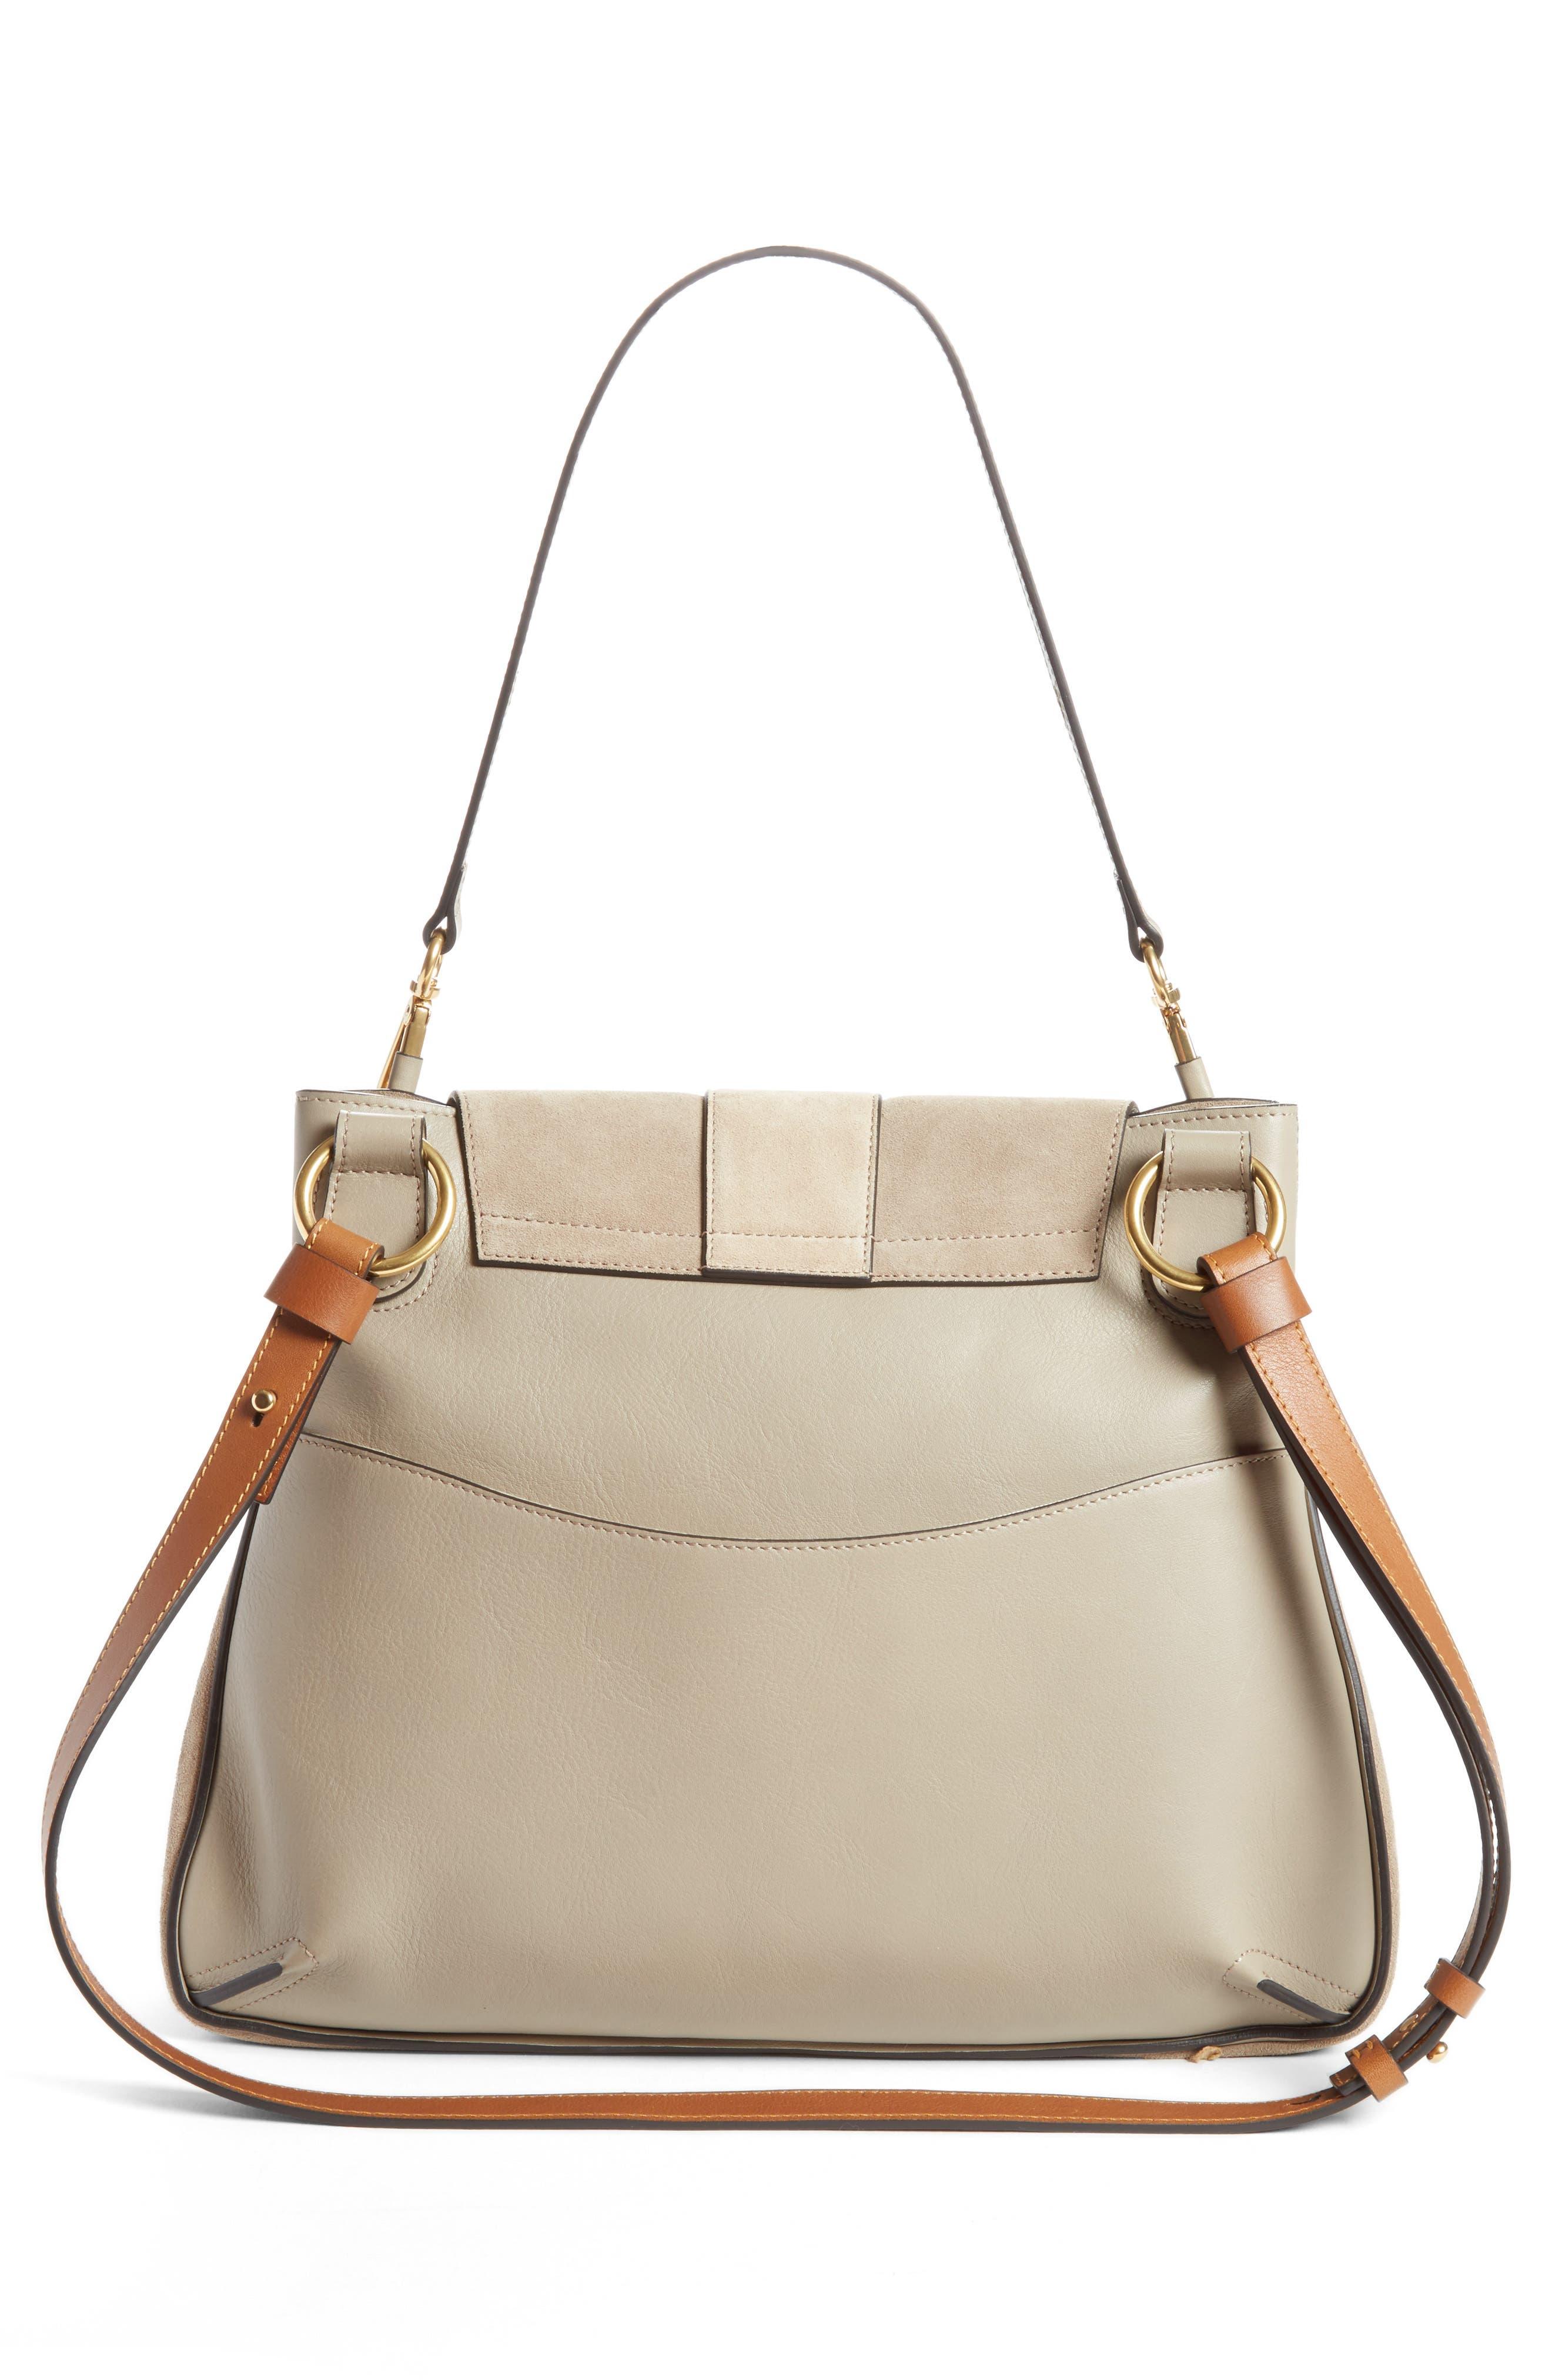 Medium Lexa Leather Shoulder Bag,                             Alternate thumbnail 2, color,                             031